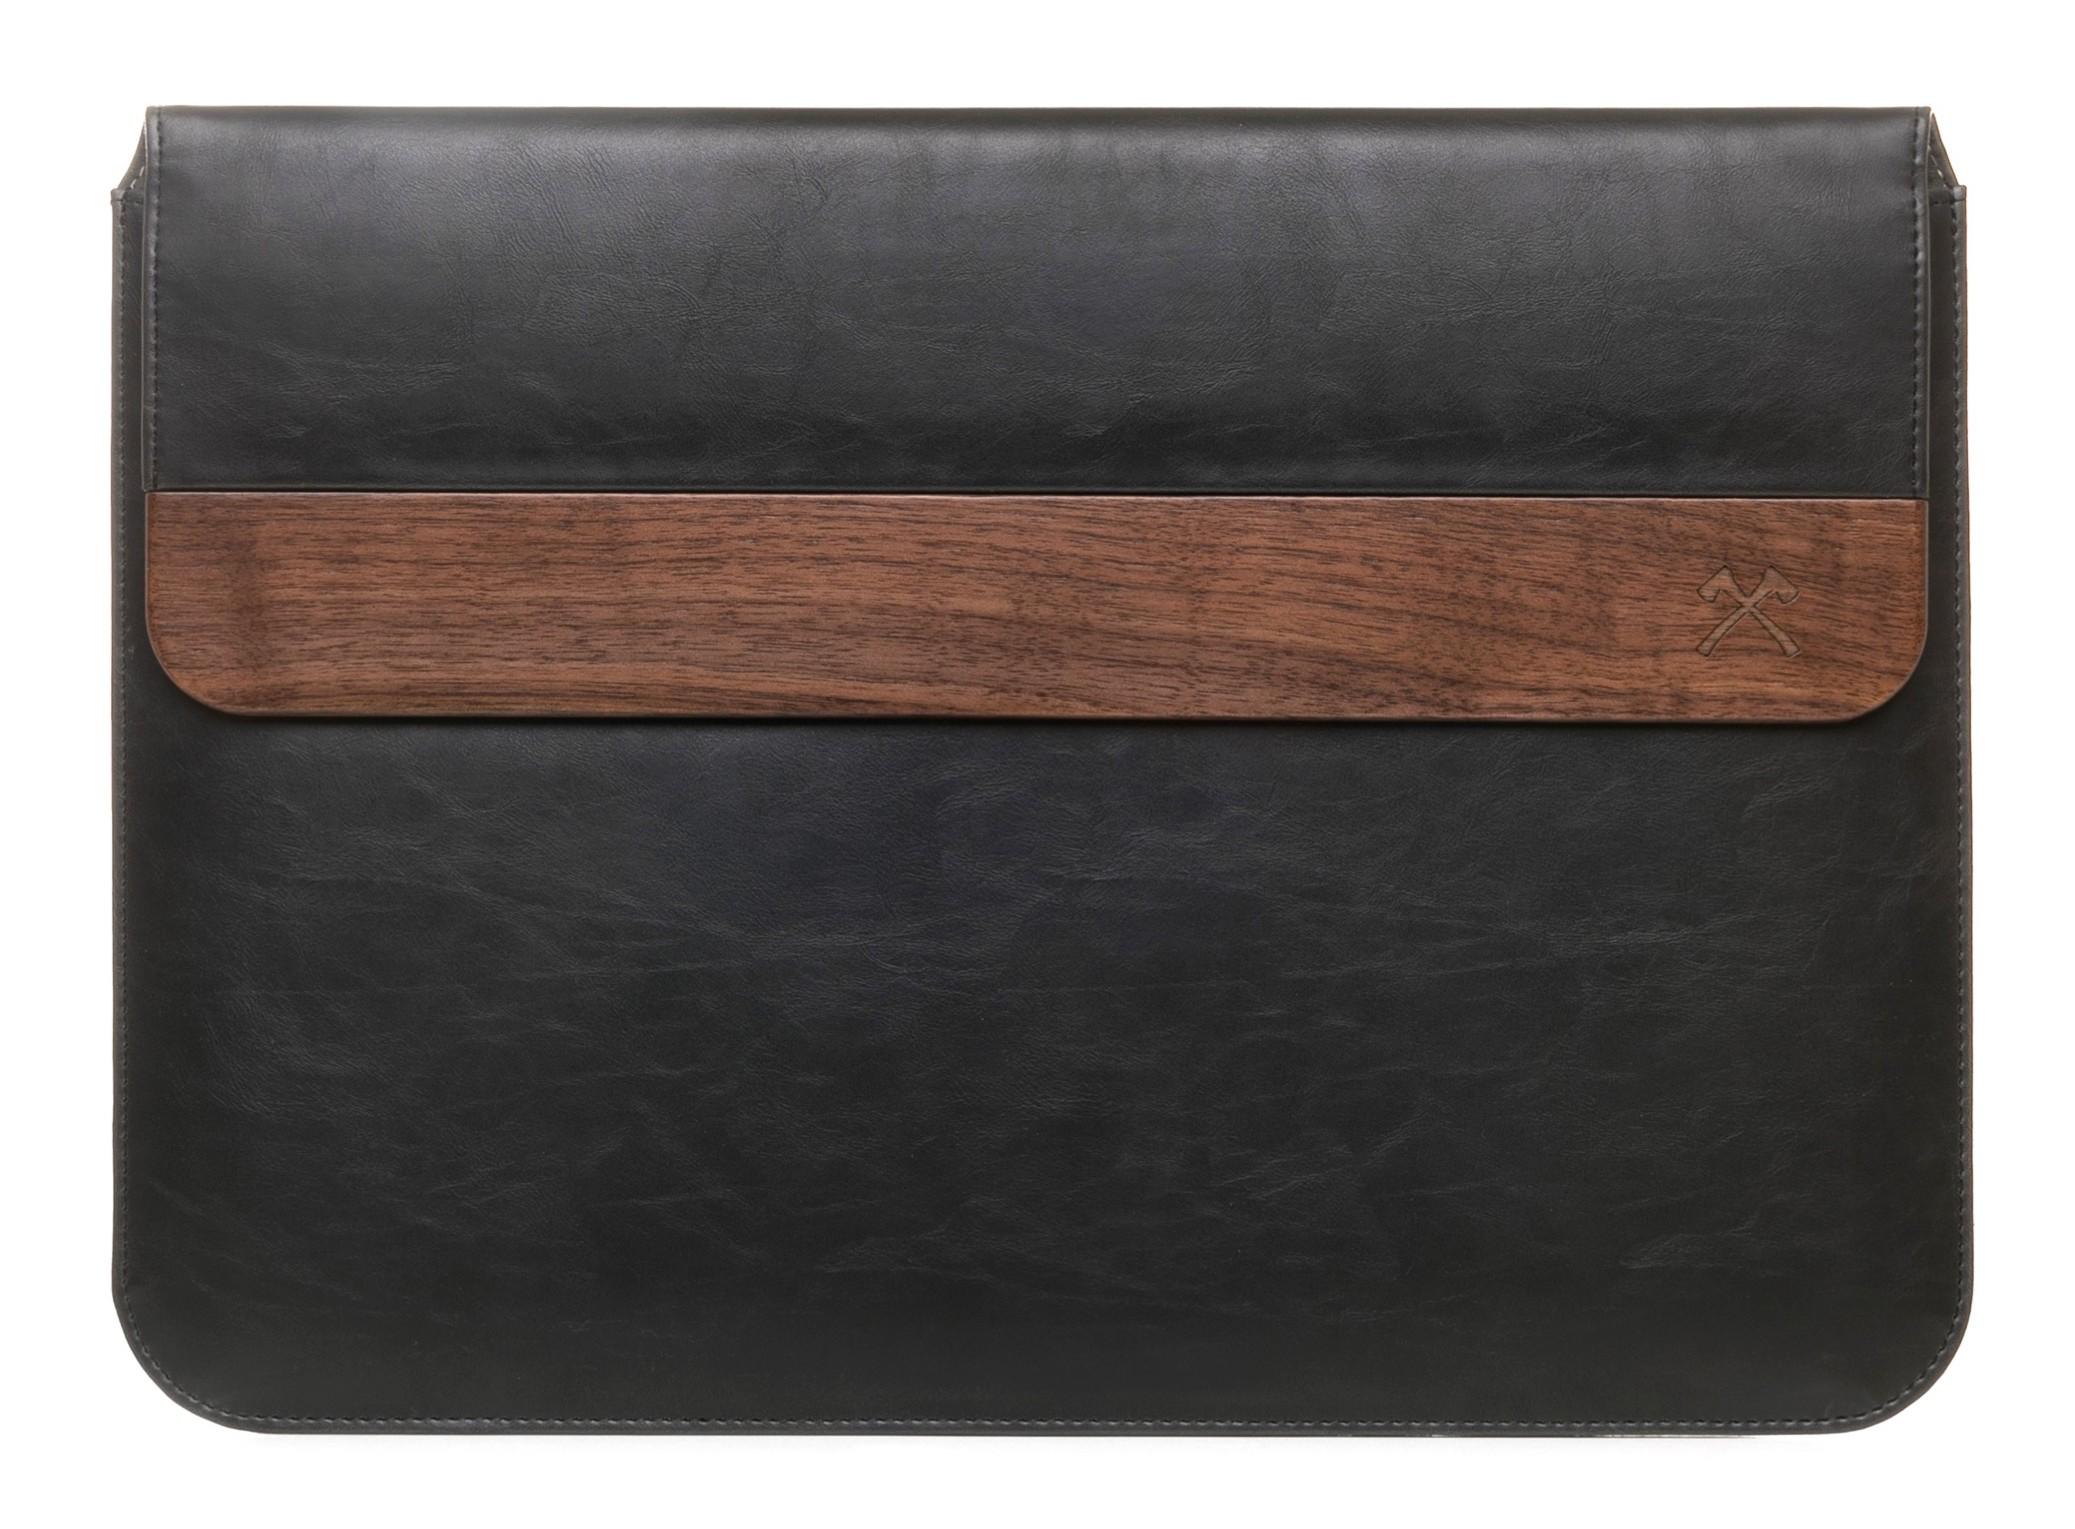 5bedde79d7 Woodcessories - Noce / Pelle Nera / MacBook Cover - MacBook 15 Pro -  Custodia Eco Pouch - Borsa MacBook in Legno - Avvenice